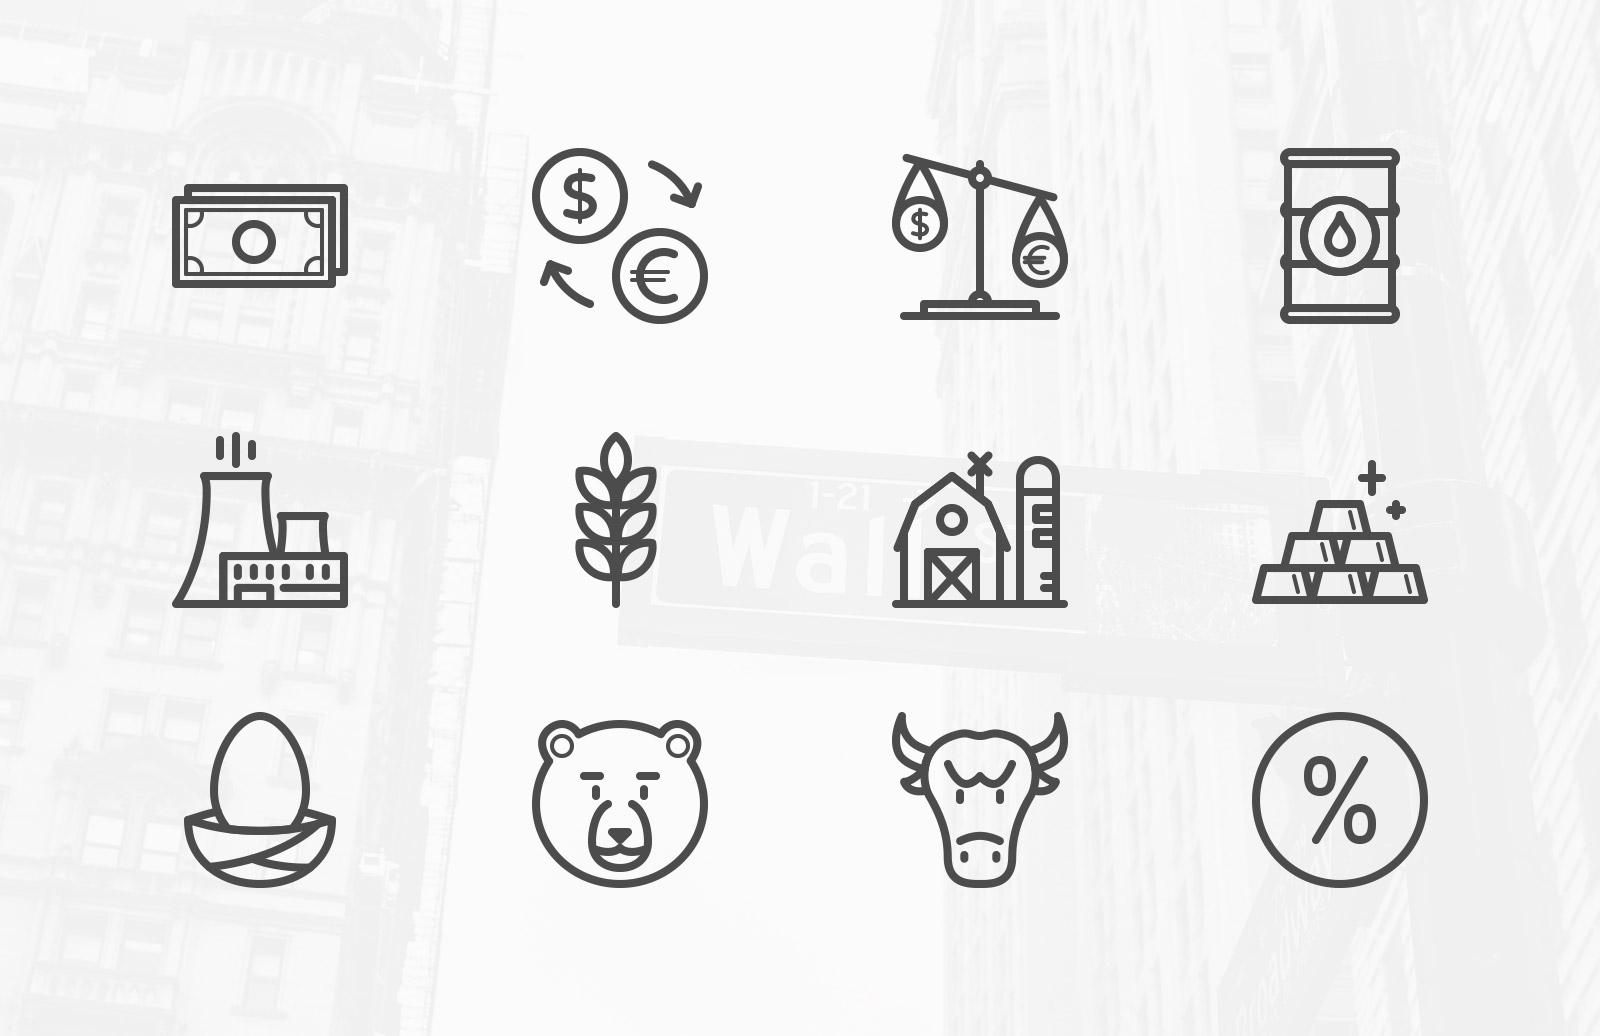 Stock Market & Commodity Icons 1